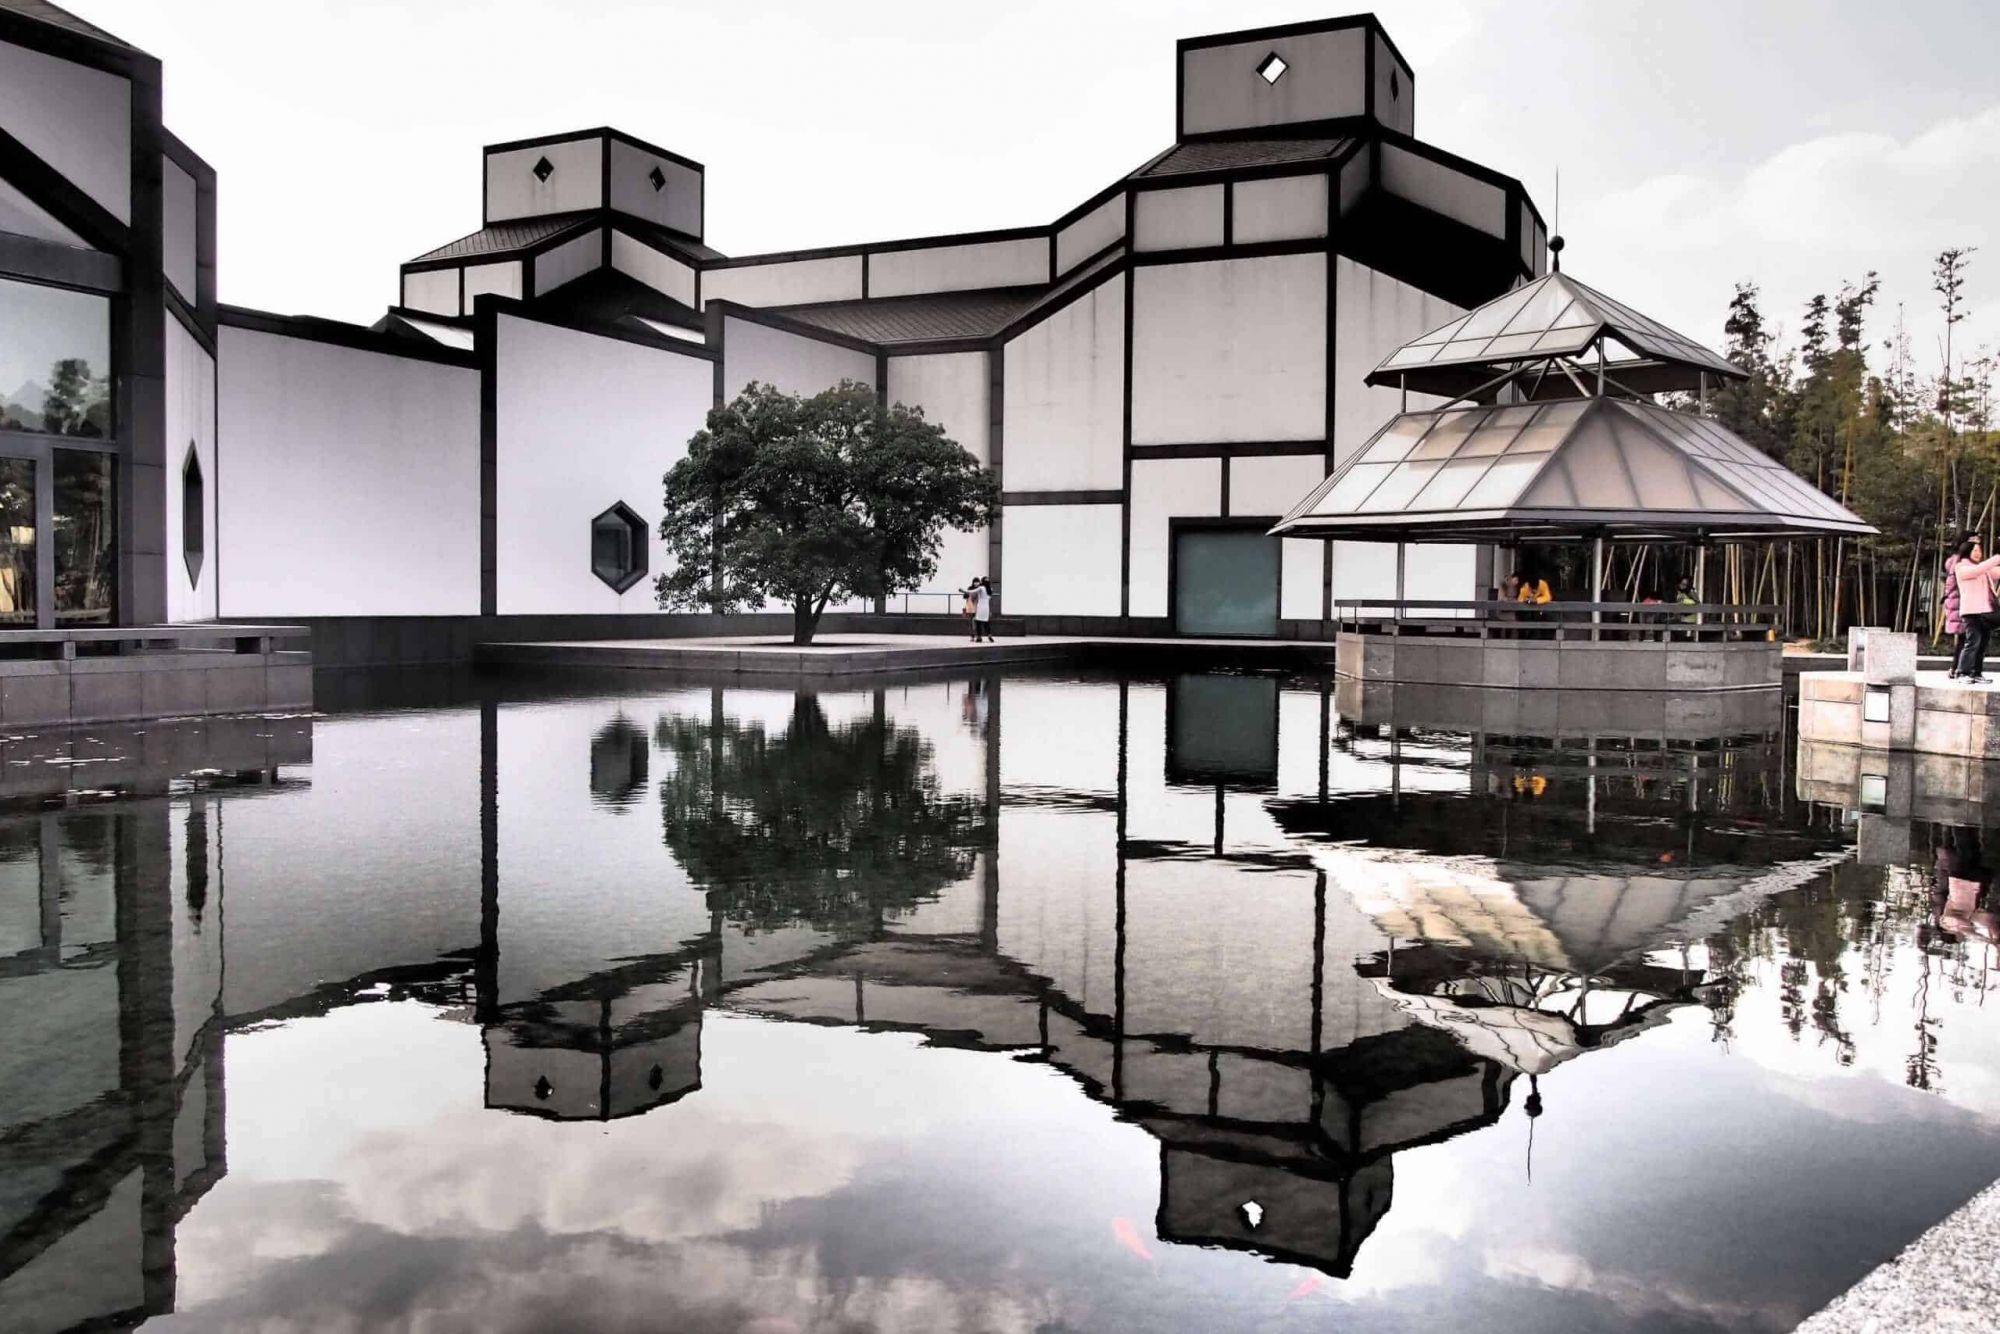 蘇州博物館Suzhou Museum 。圖片來源:NONAGON.style